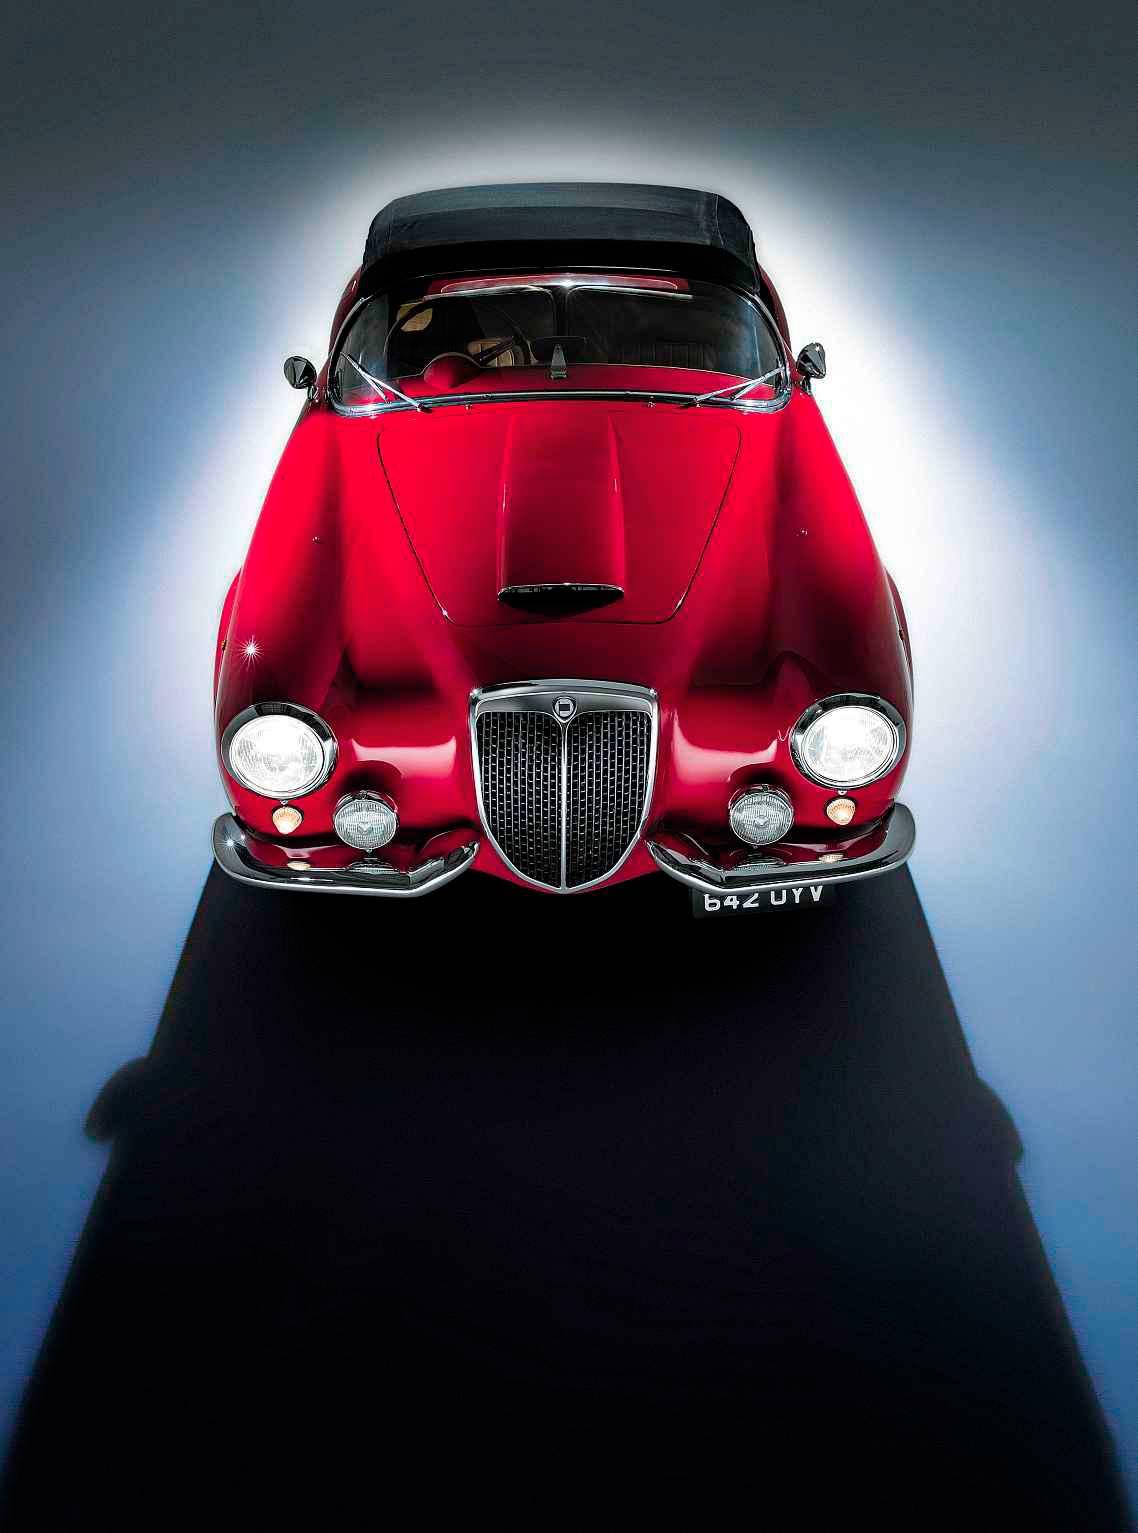 1955 Lancia Aurelia B24 America front